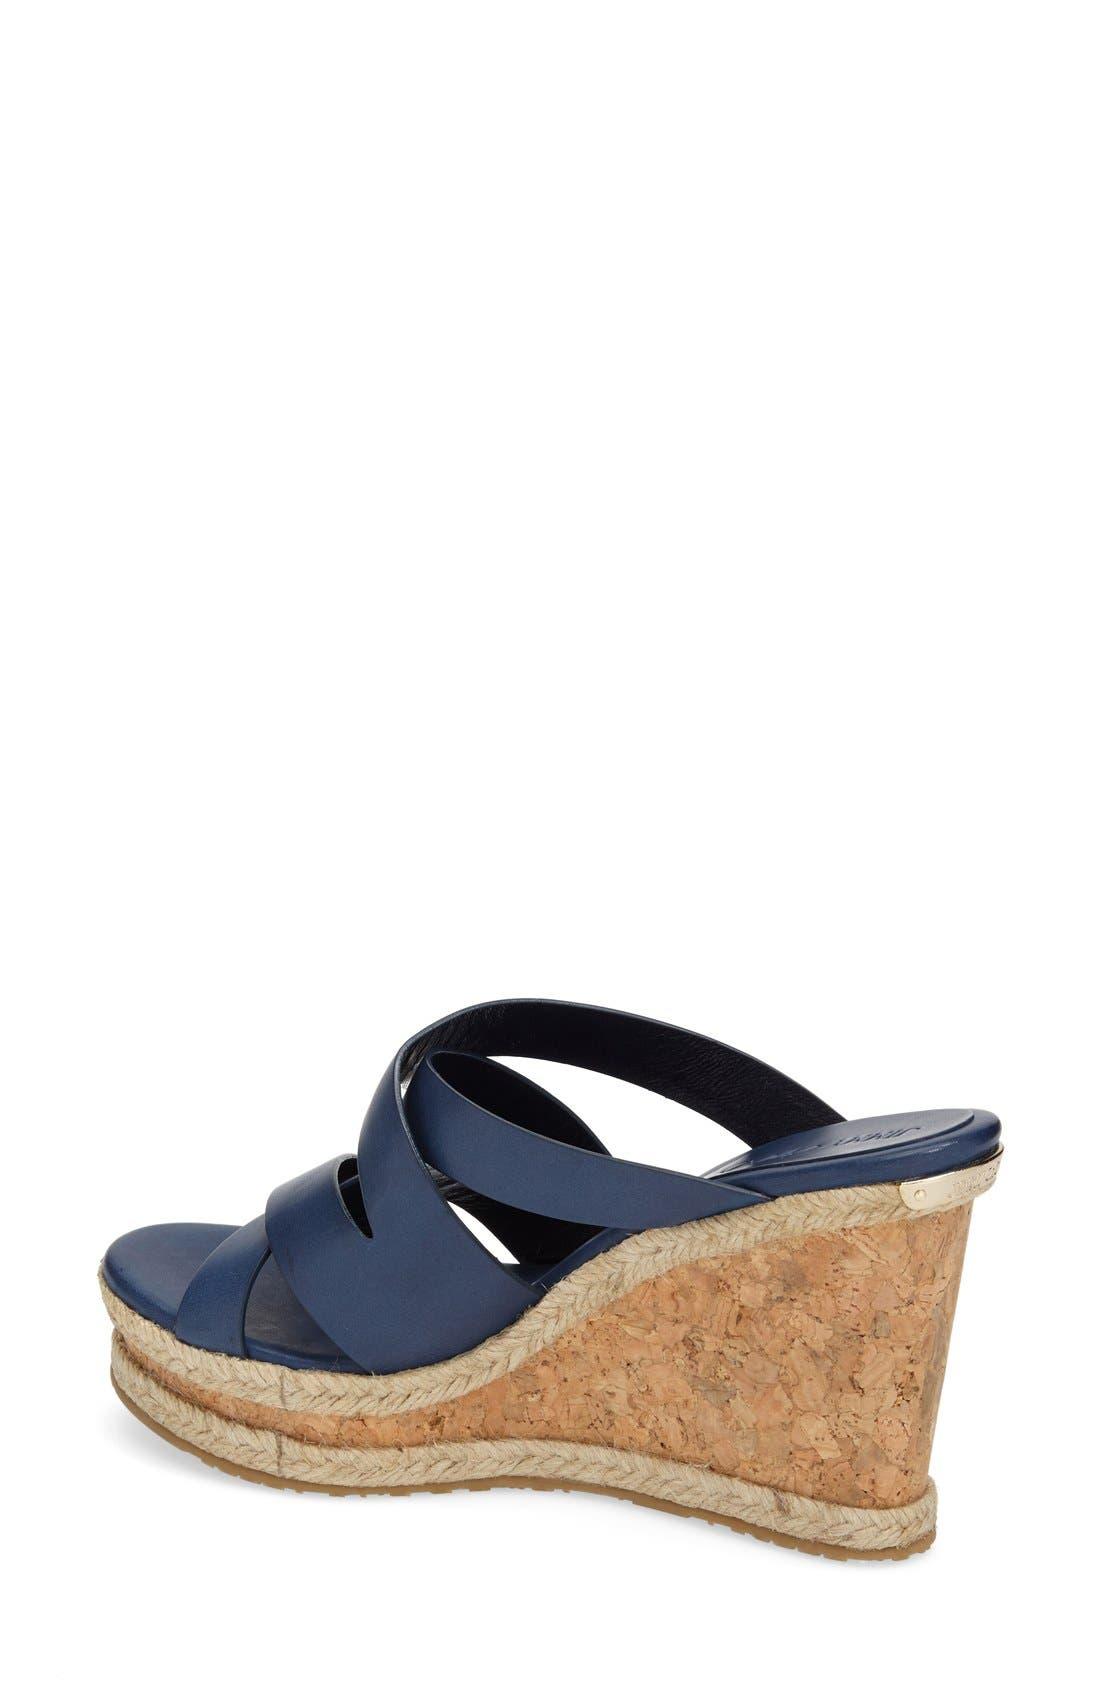 'Prisma' Leather Wedge Sandal,                             Alternate thumbnail 2, color,                             400